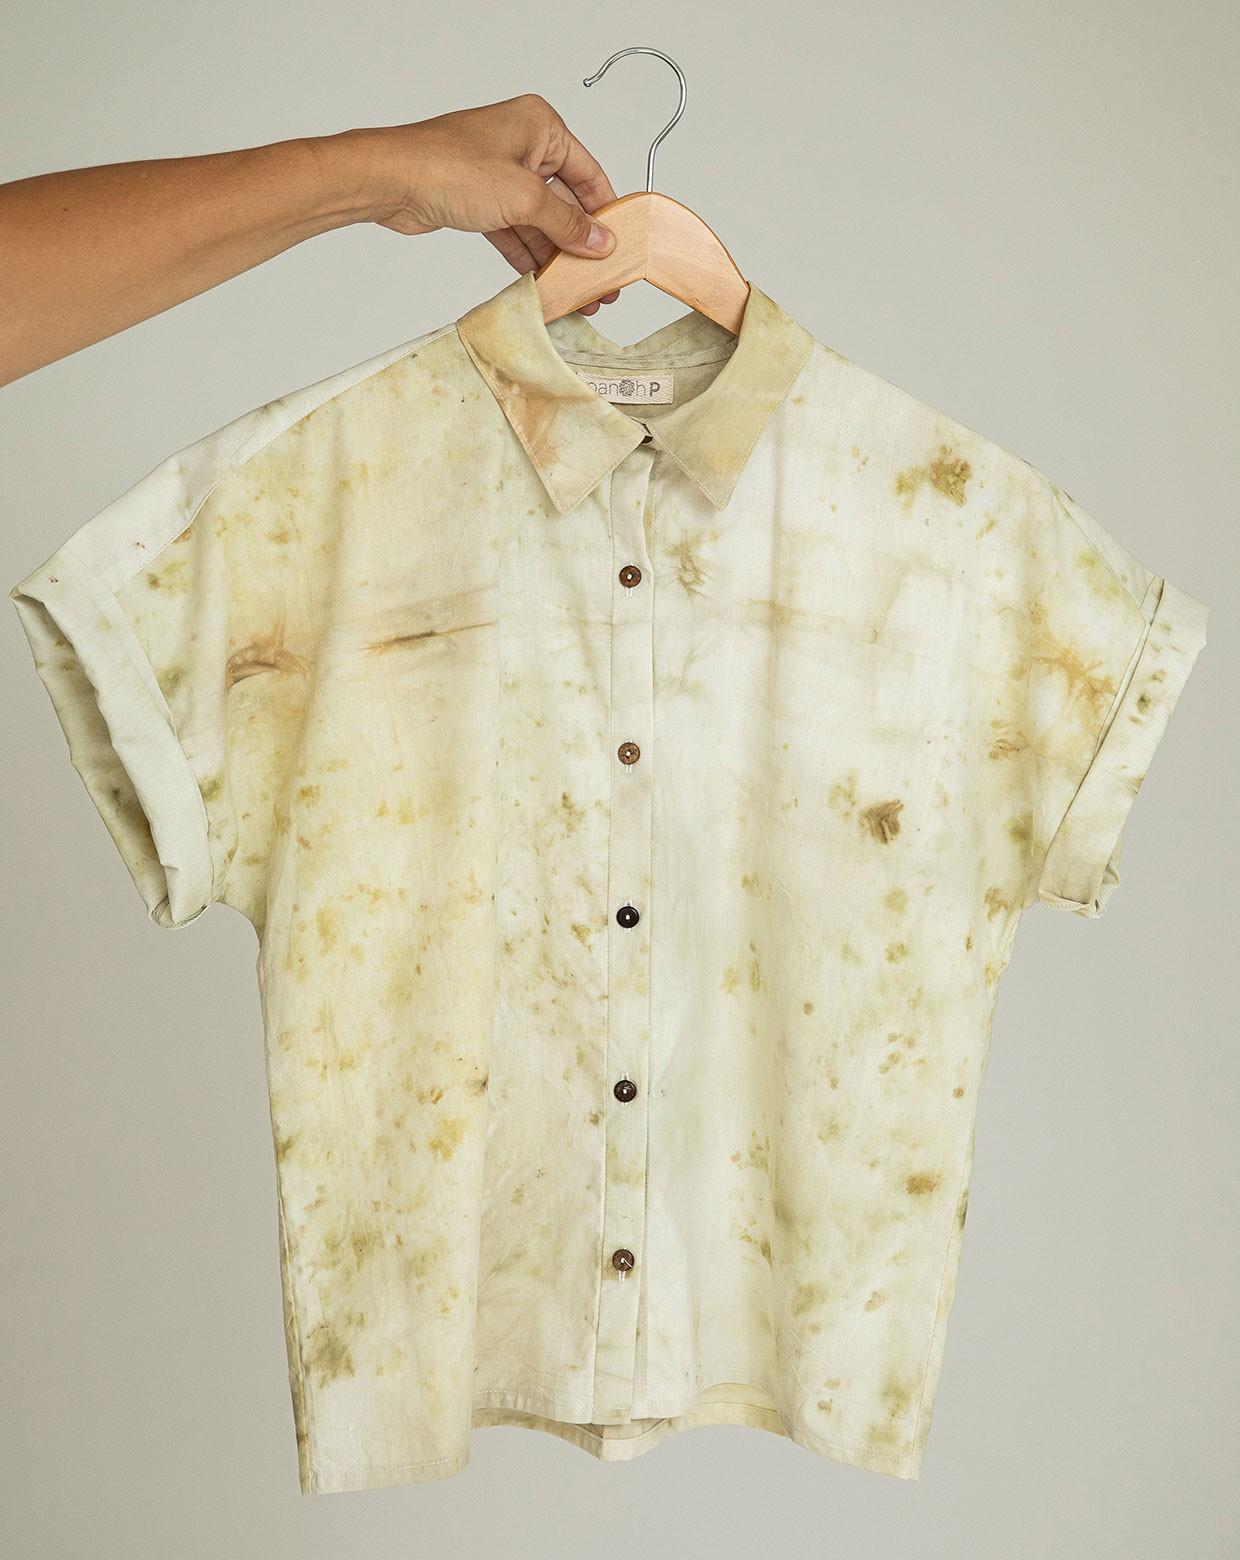 Camisa Yara Macela - Impressão Botânica